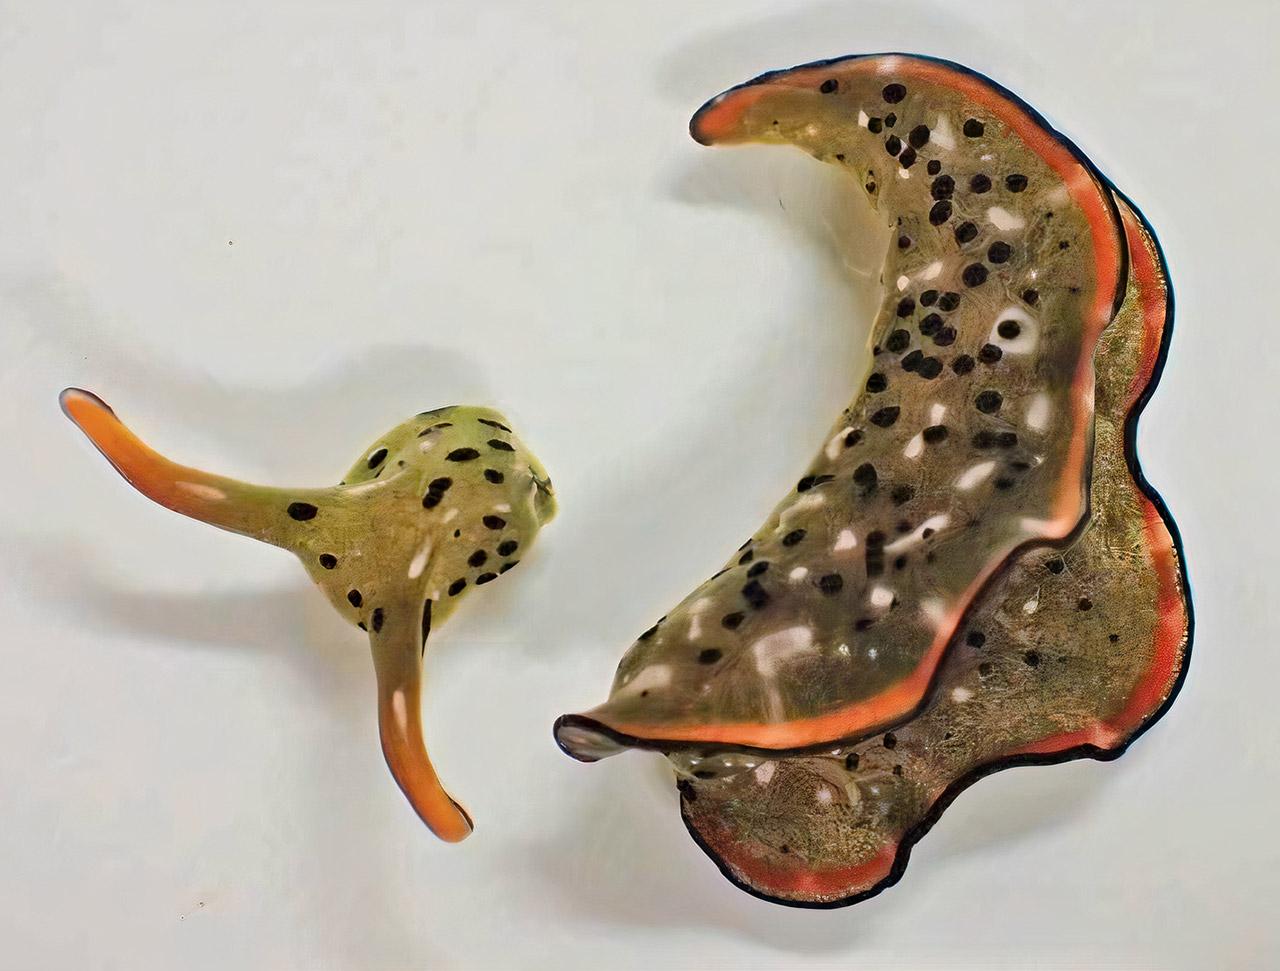 Marginata Sea Slug Cut Off Head